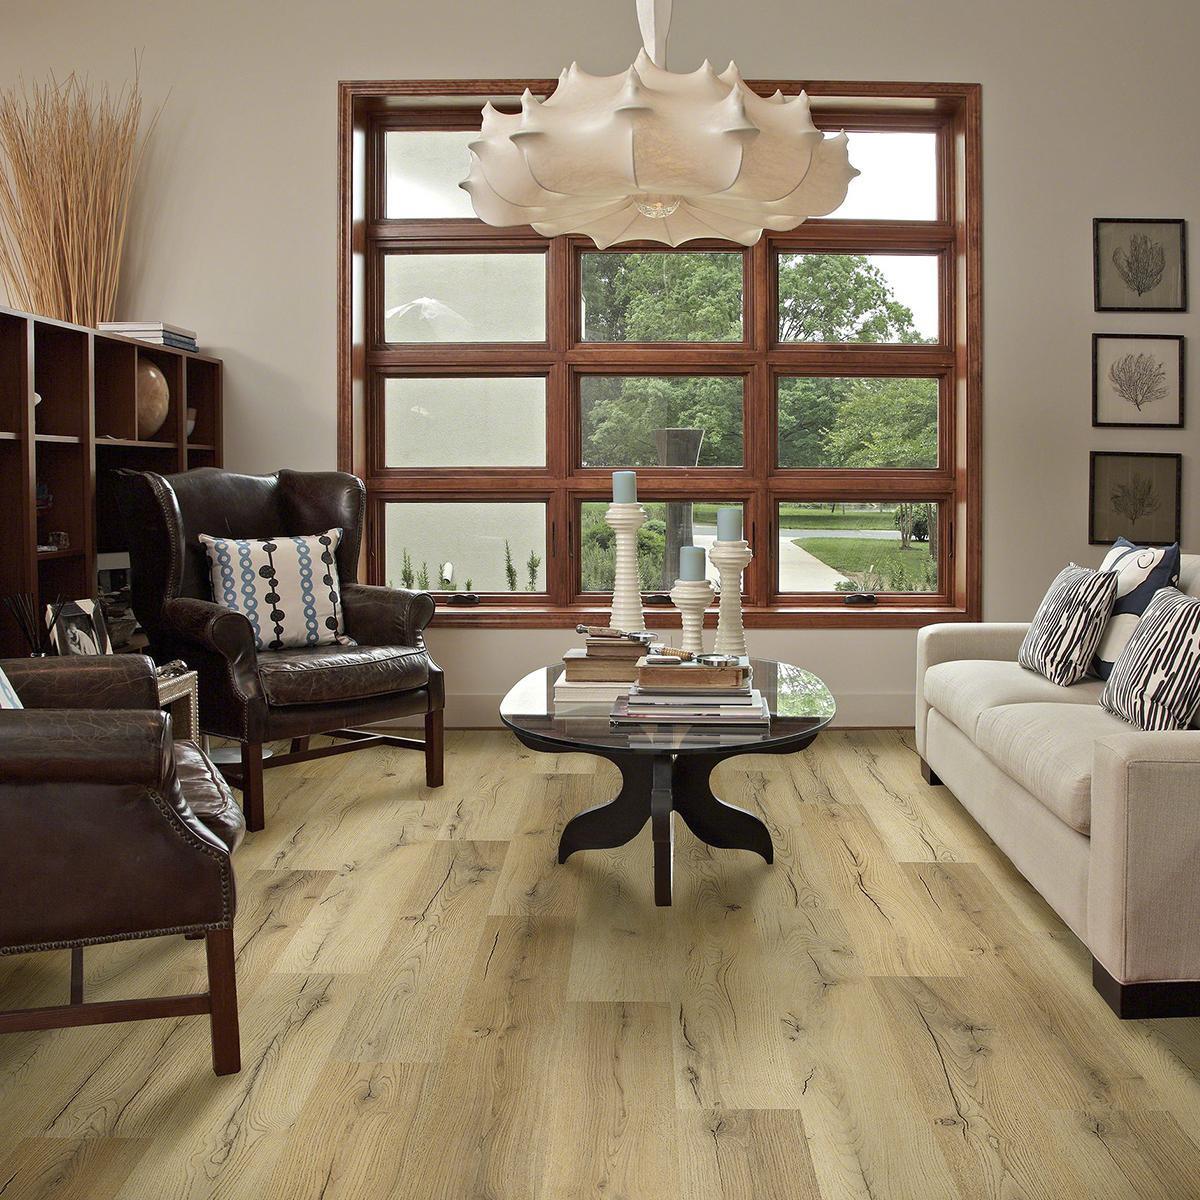 is bamboo hardwood flooring good of shaw vision works warm gold laminate nebraska furniture mart with regard to vision works warm gold laminate